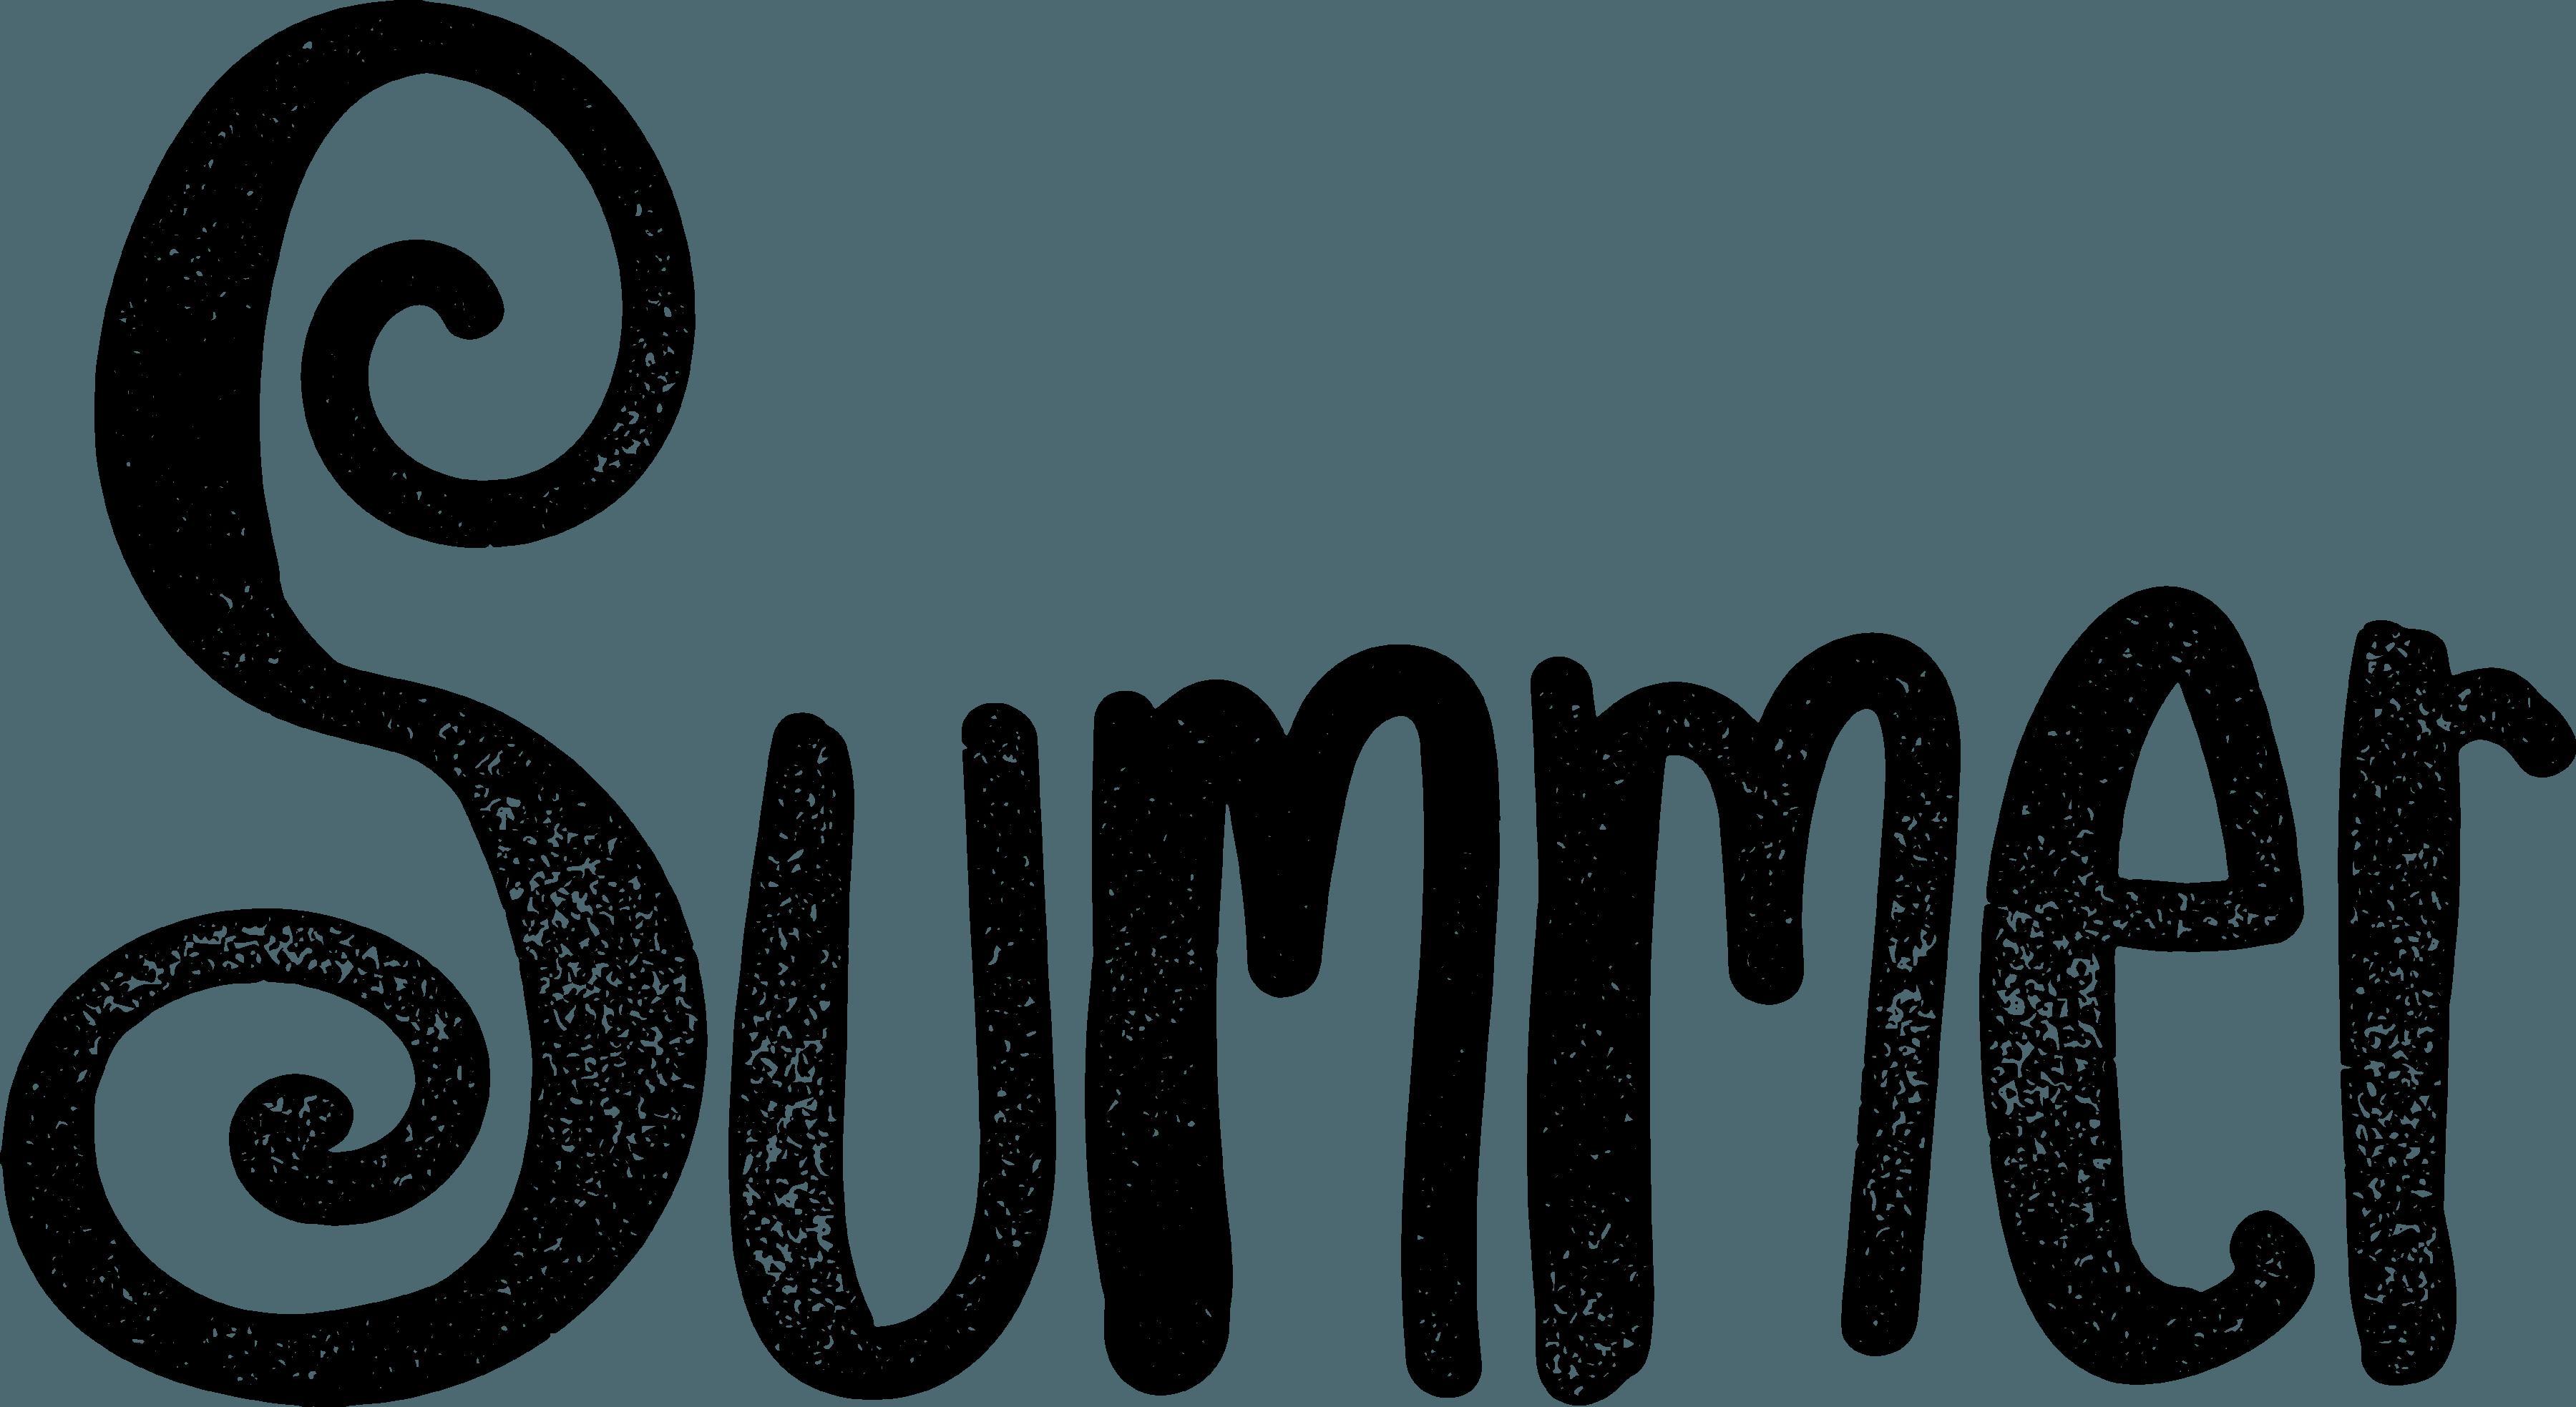 Clipart summer word. Hg portal way farm